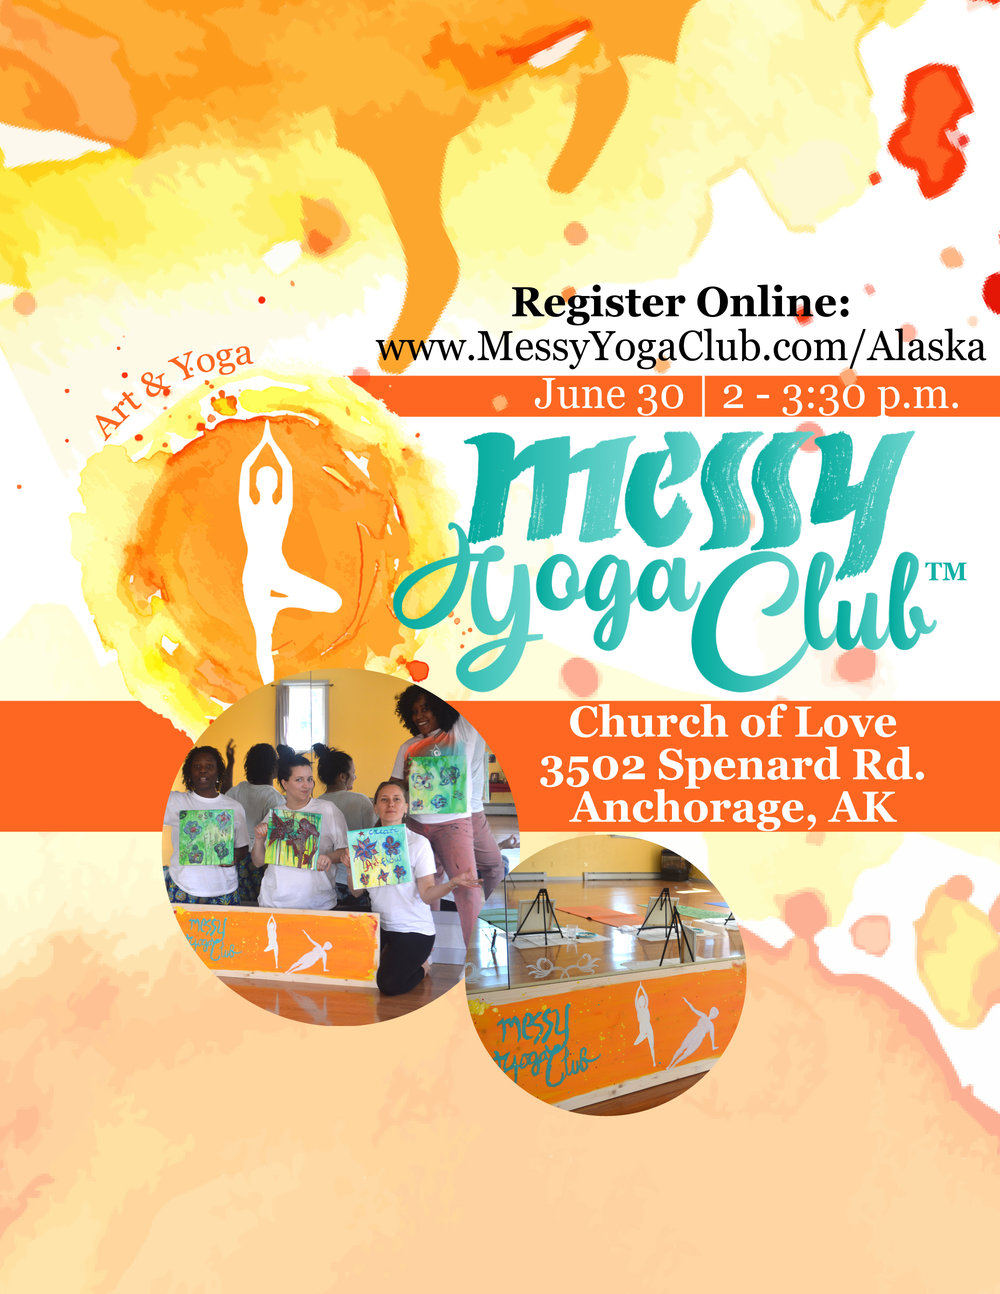 Messy-Yoga-Church-of-Love-June-30.jpg